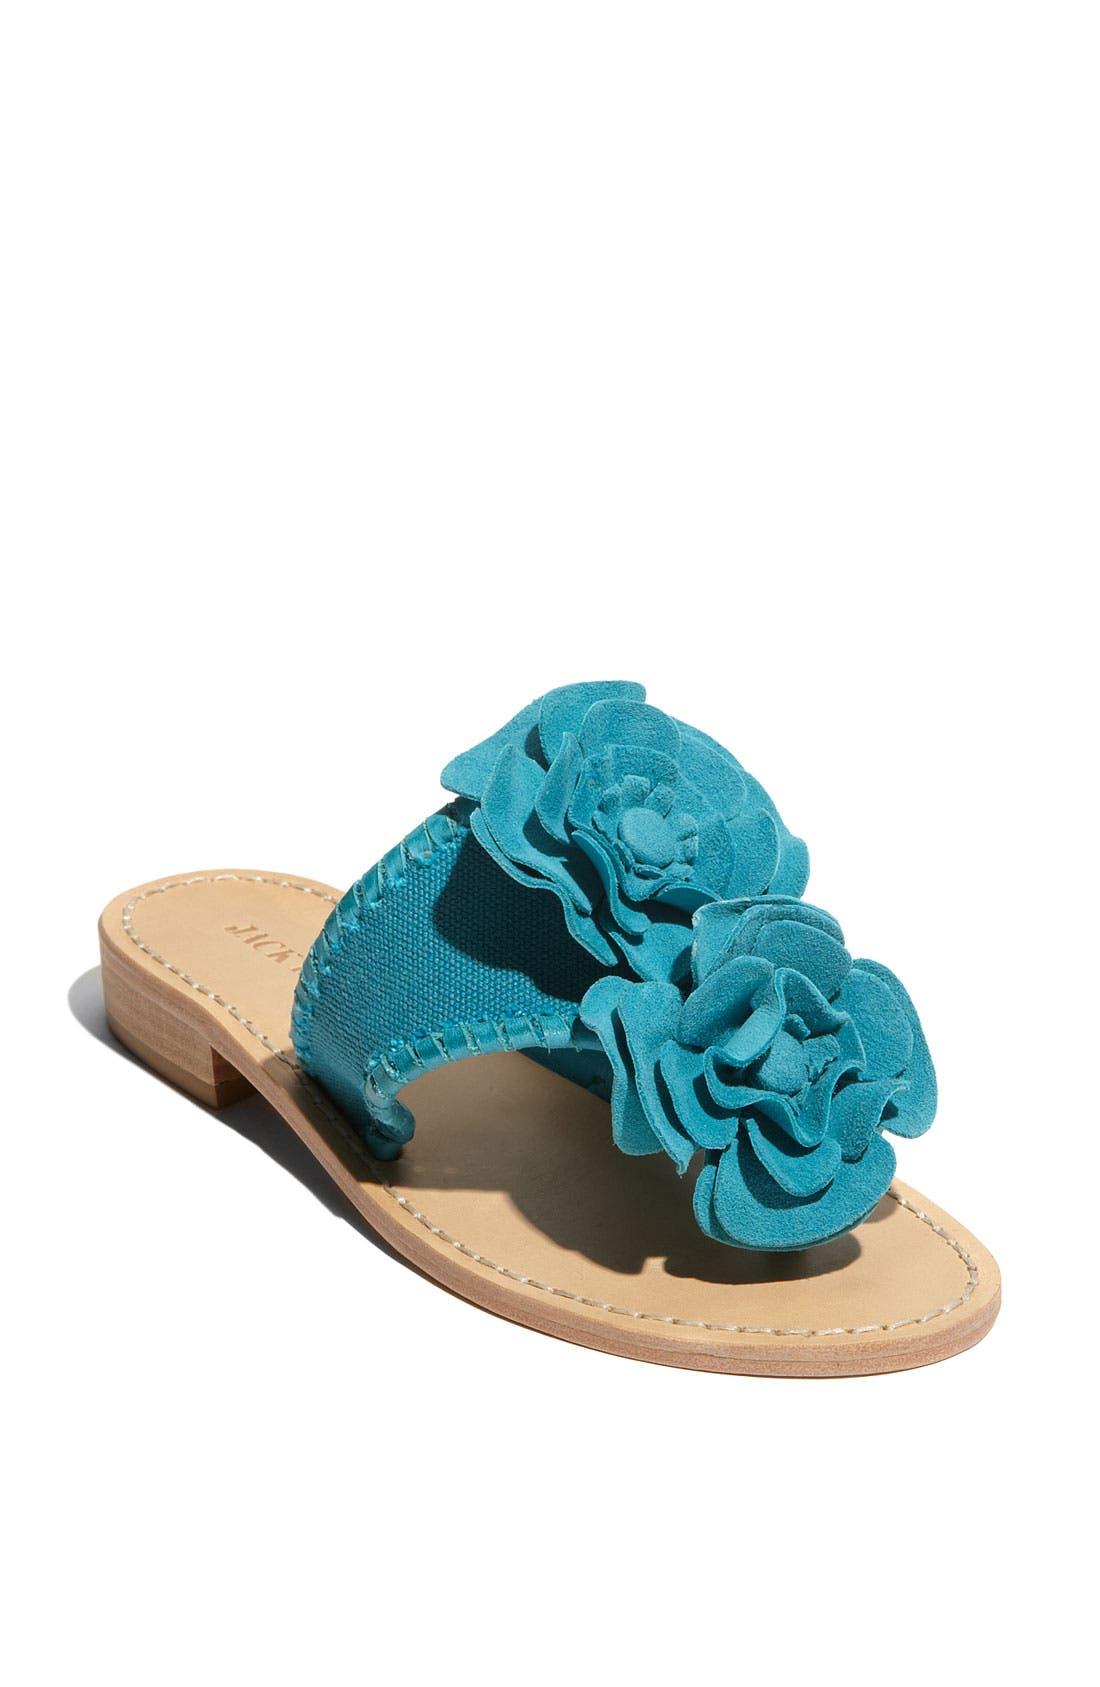 Alternate Image 1 Selected - Jack Rogers 'Wellesley' Flat Sandal